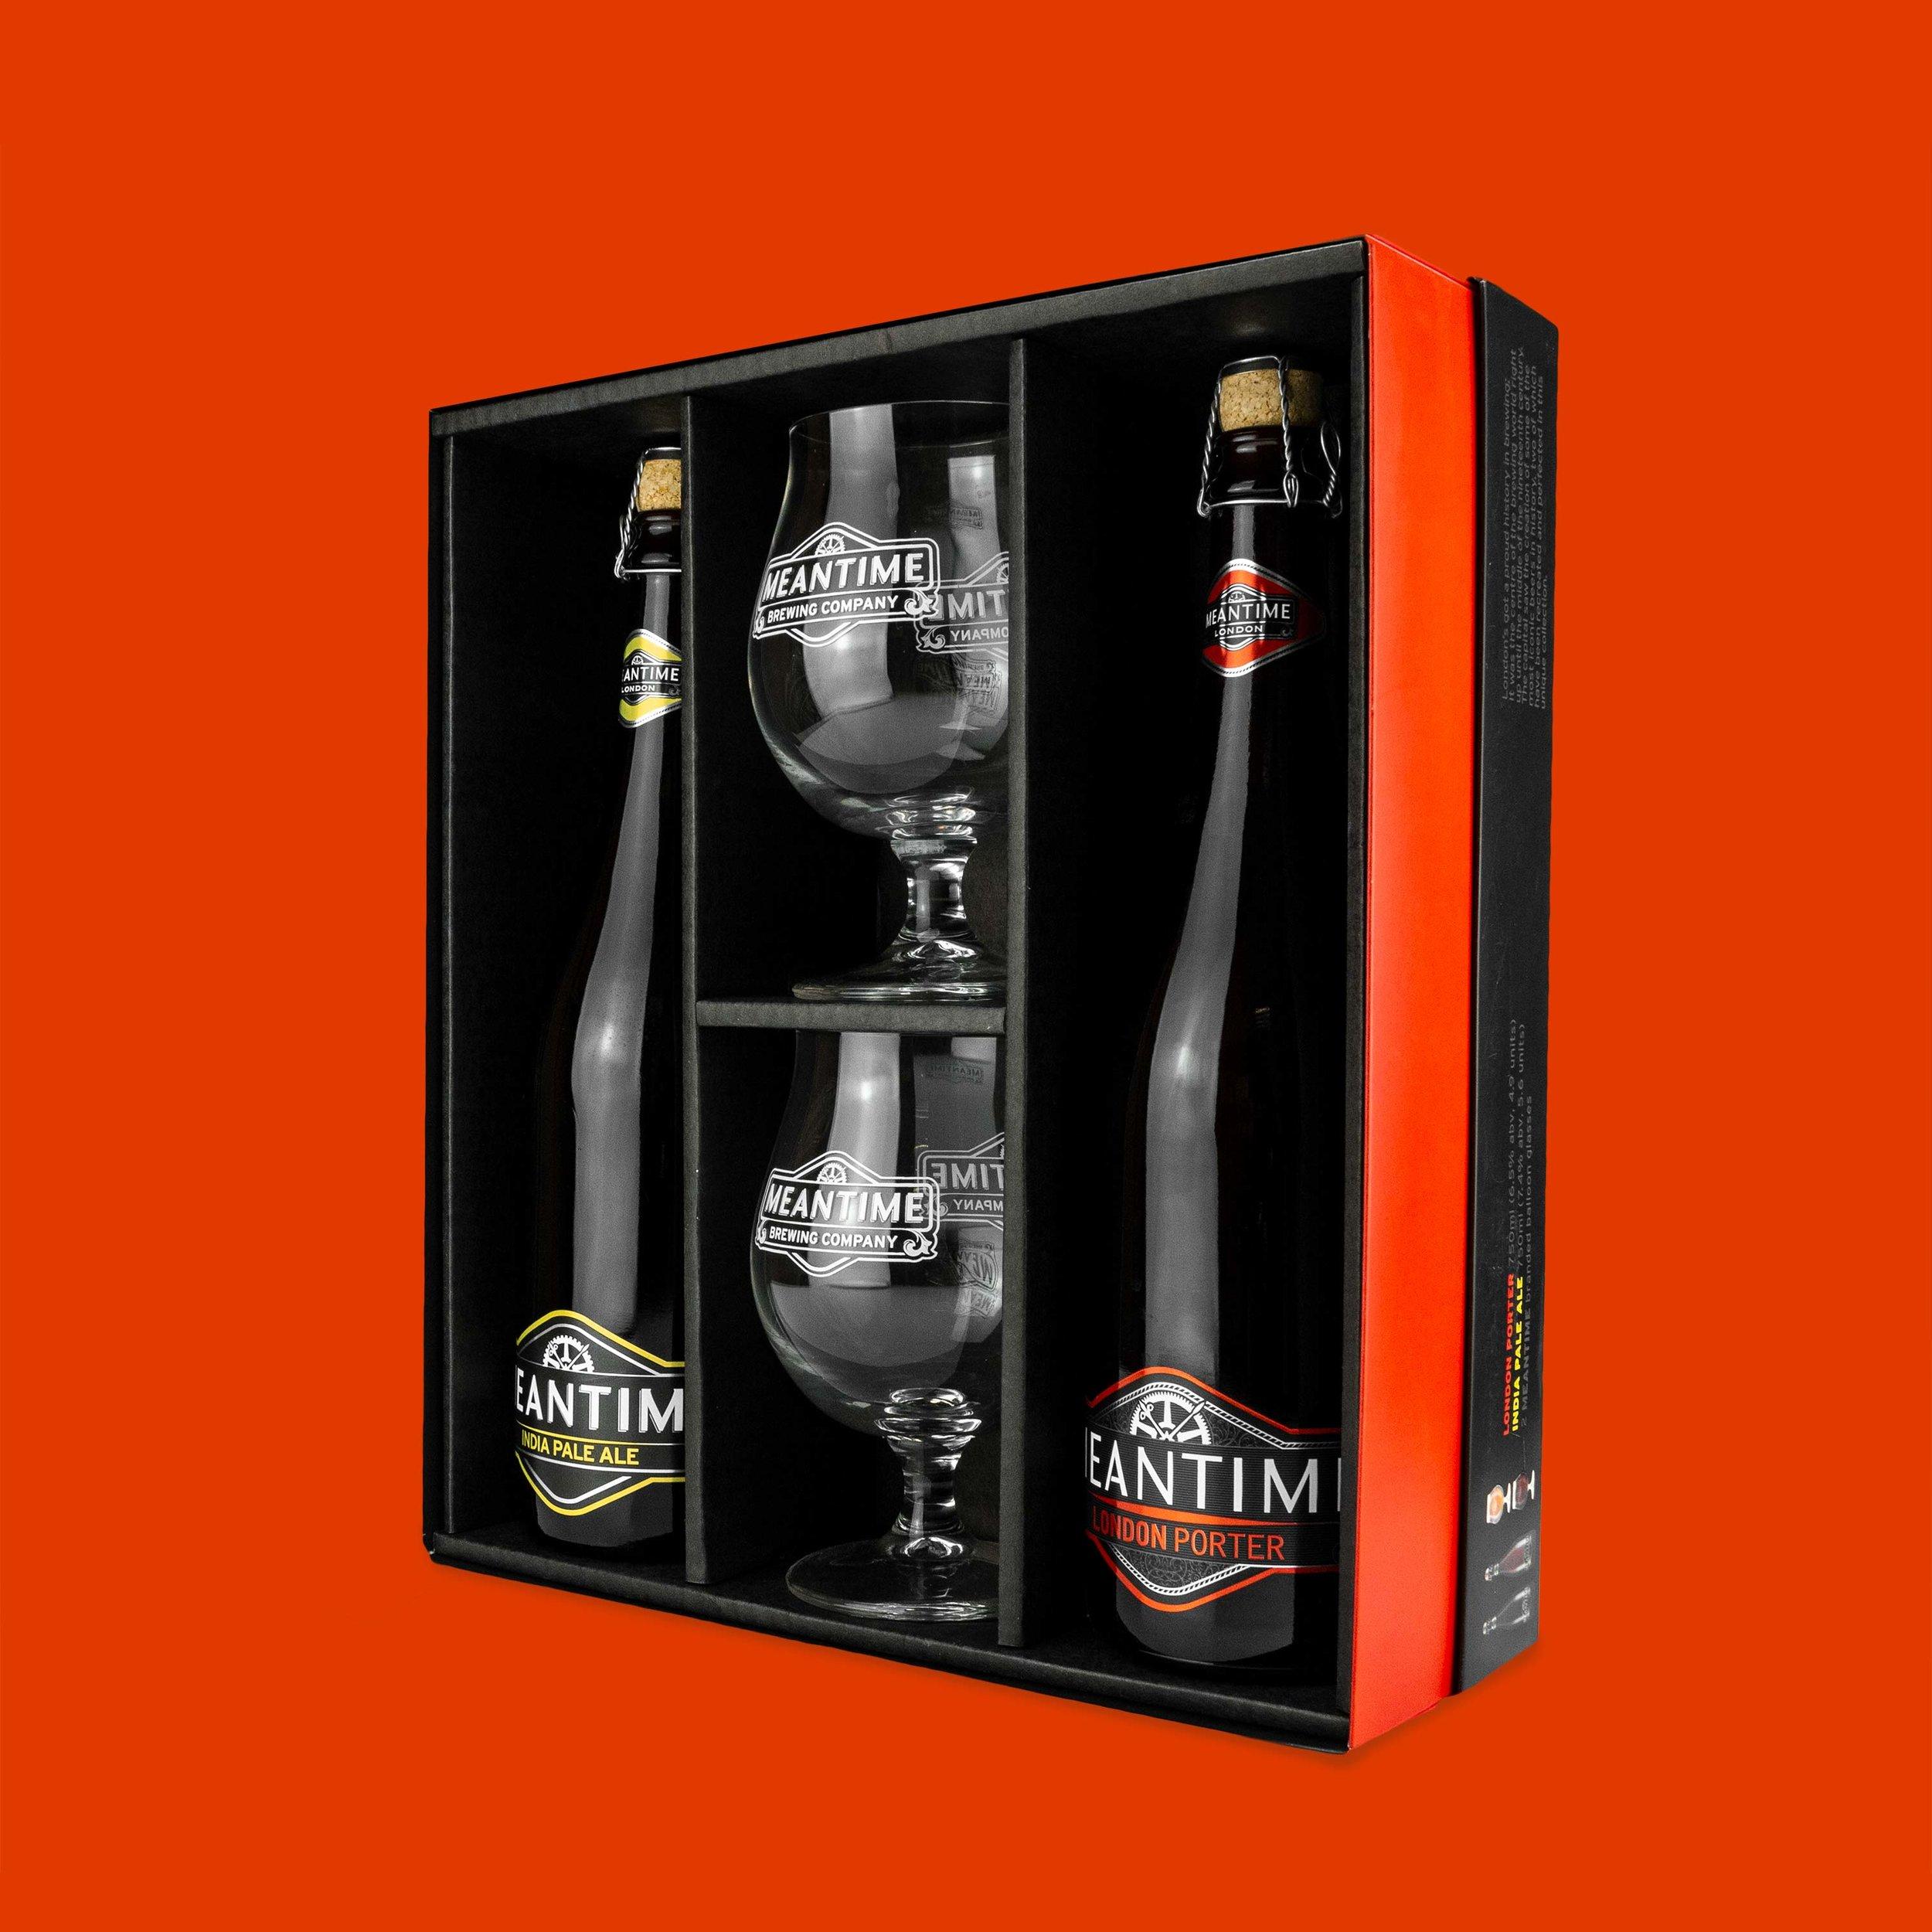 Meantime-Trio-Gift-Inside-Box-Mail-Order-Box-Packaging-Prototype-Design.jpg